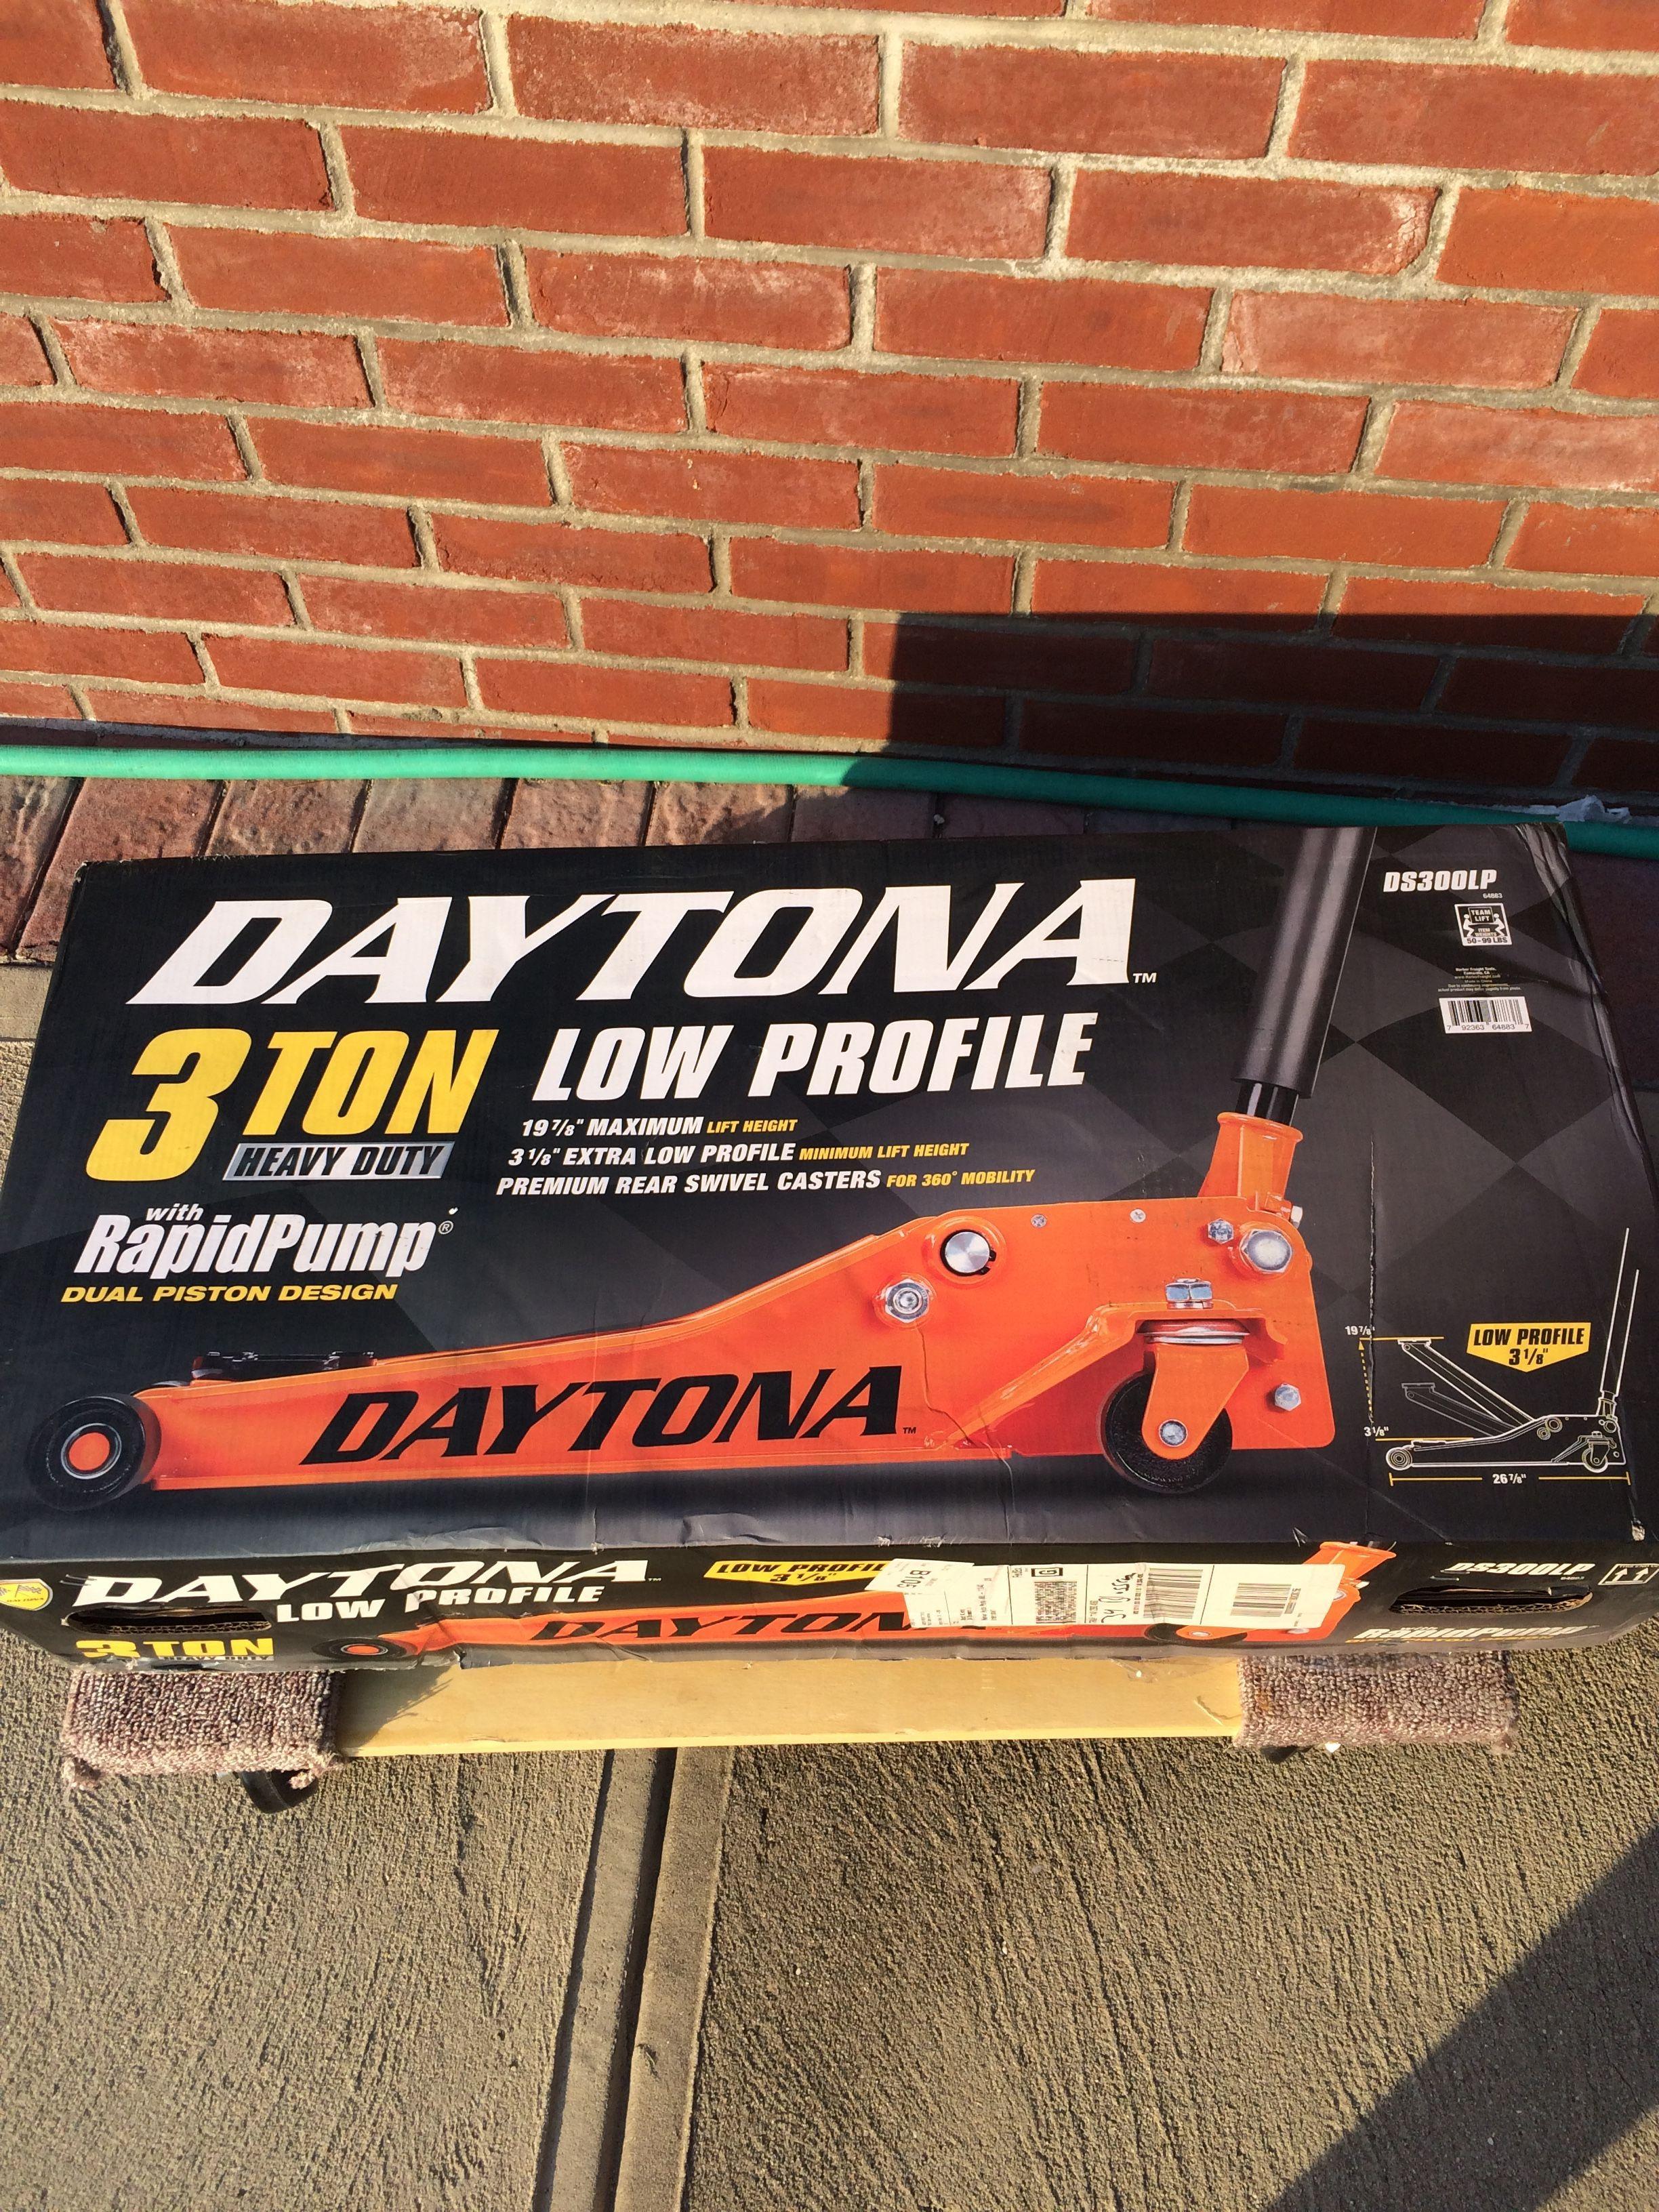 Daytona 3 Ton Floor Jack Review Oil Change Profile Concrete Driveways